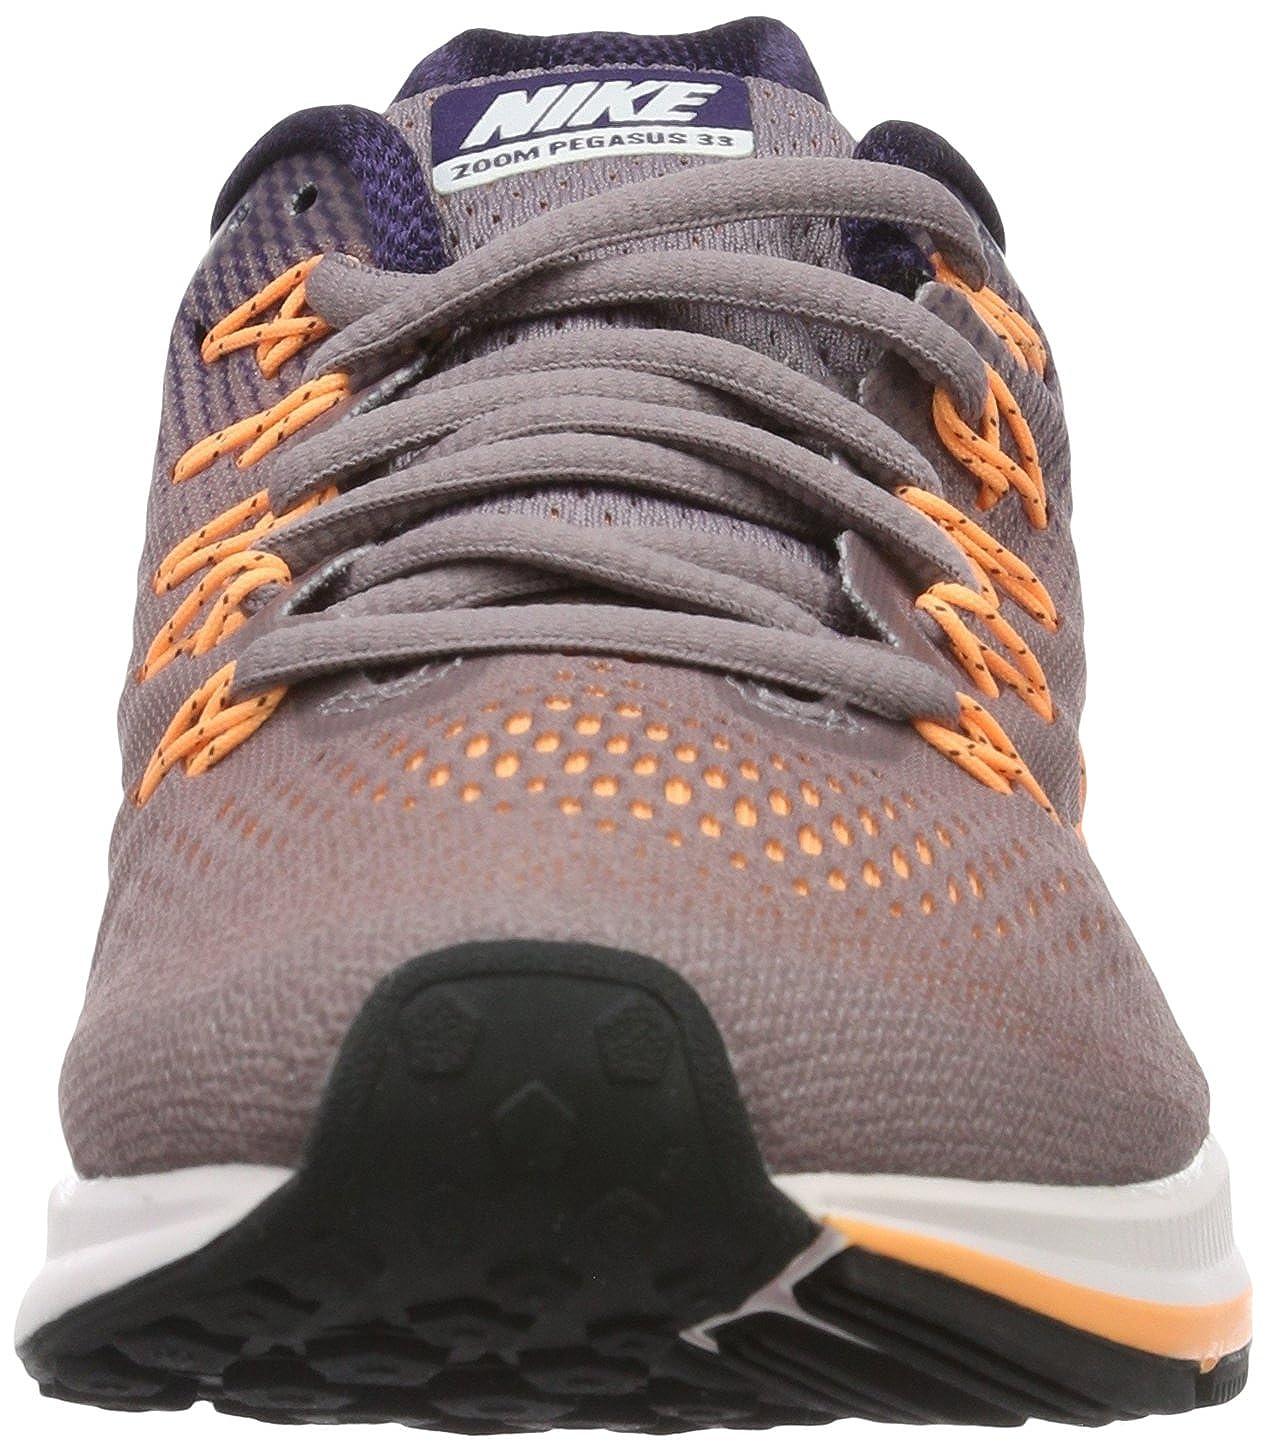 3ceda8e90c36 Nike WMNS Air Zoom Pegasus 33